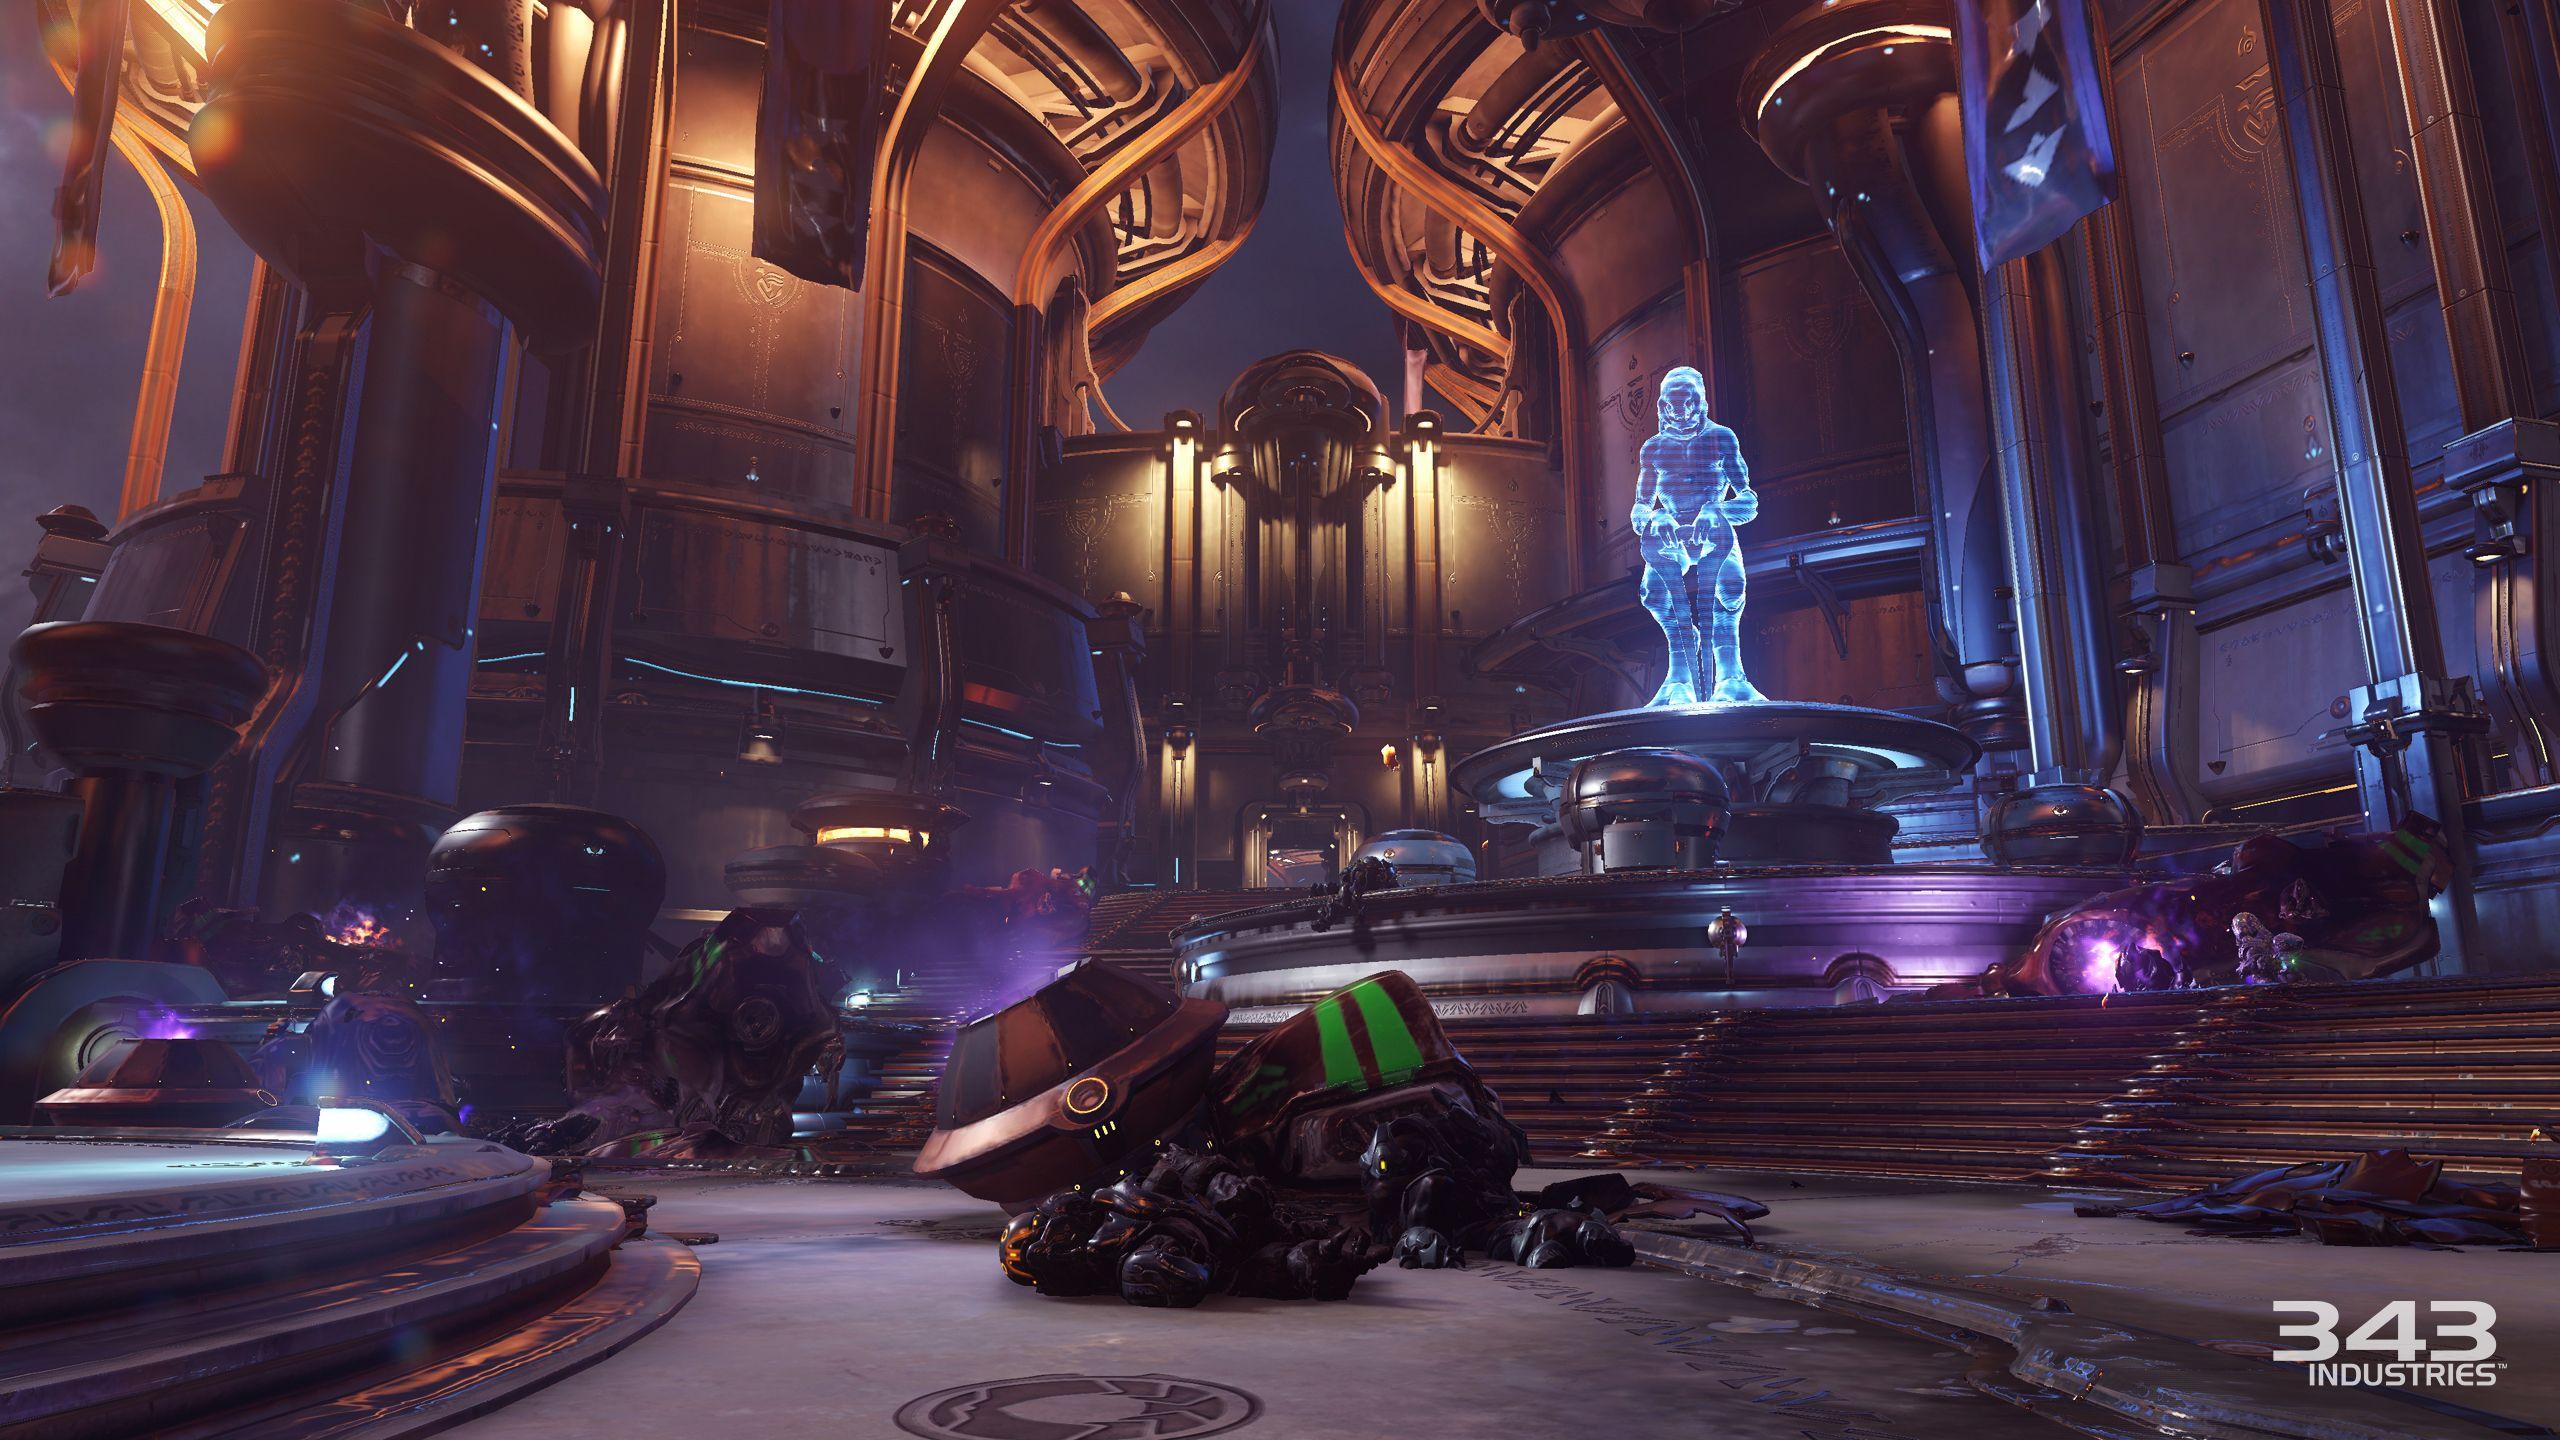 Halo 5: Guardians - Novas imagens do modo Warzone e da Campanha H5-guardians-establishing-campaign-battle-of-sunaion-wrecking-ball